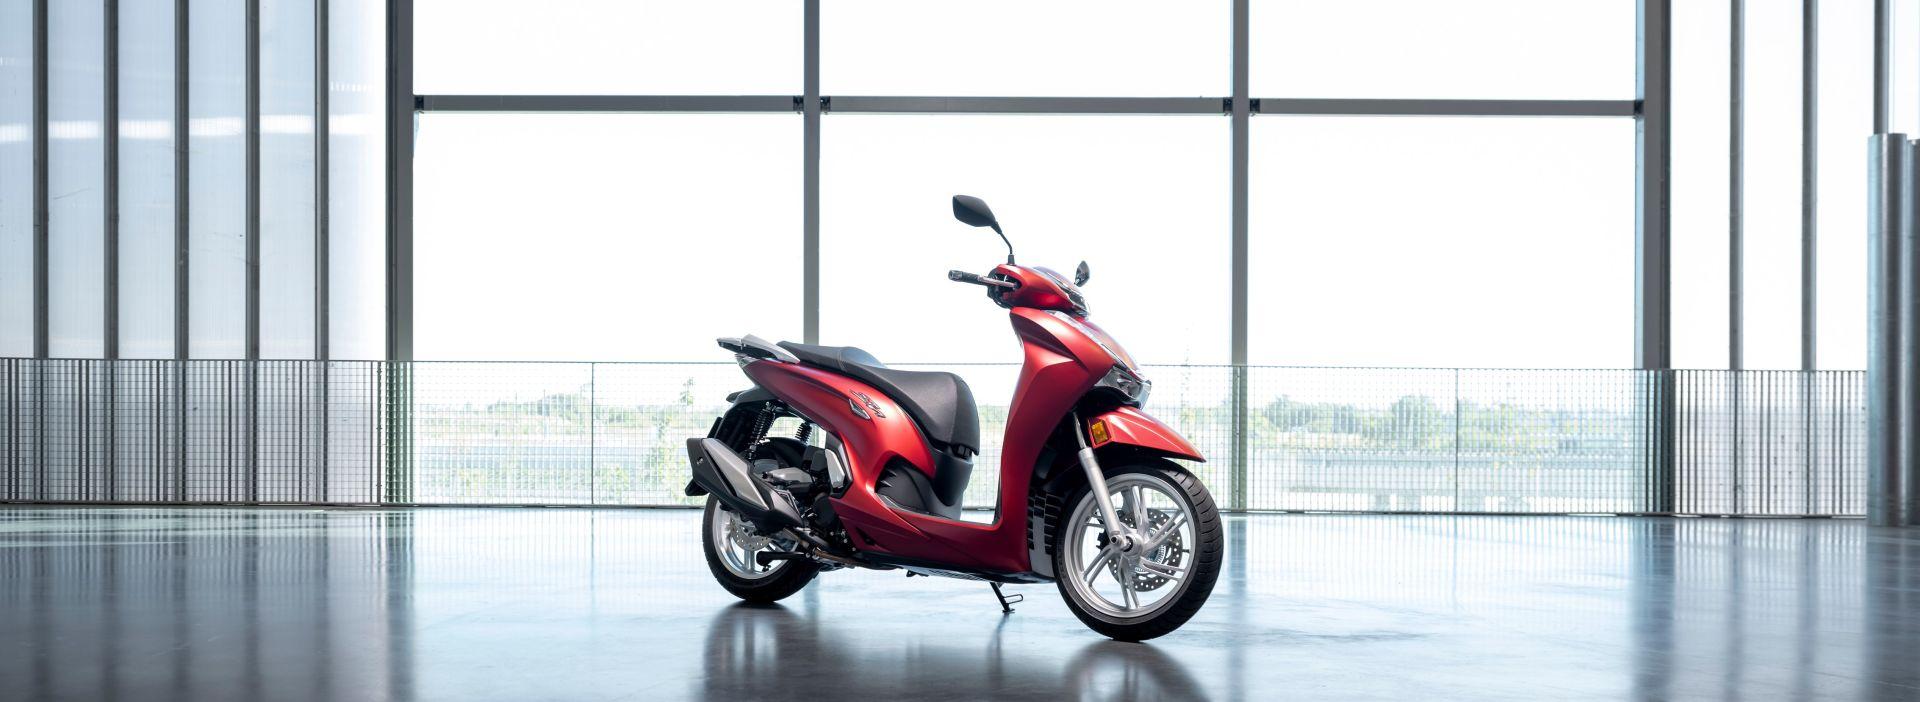 Honda NC 700 X A 700cc Adventure Motorcycle